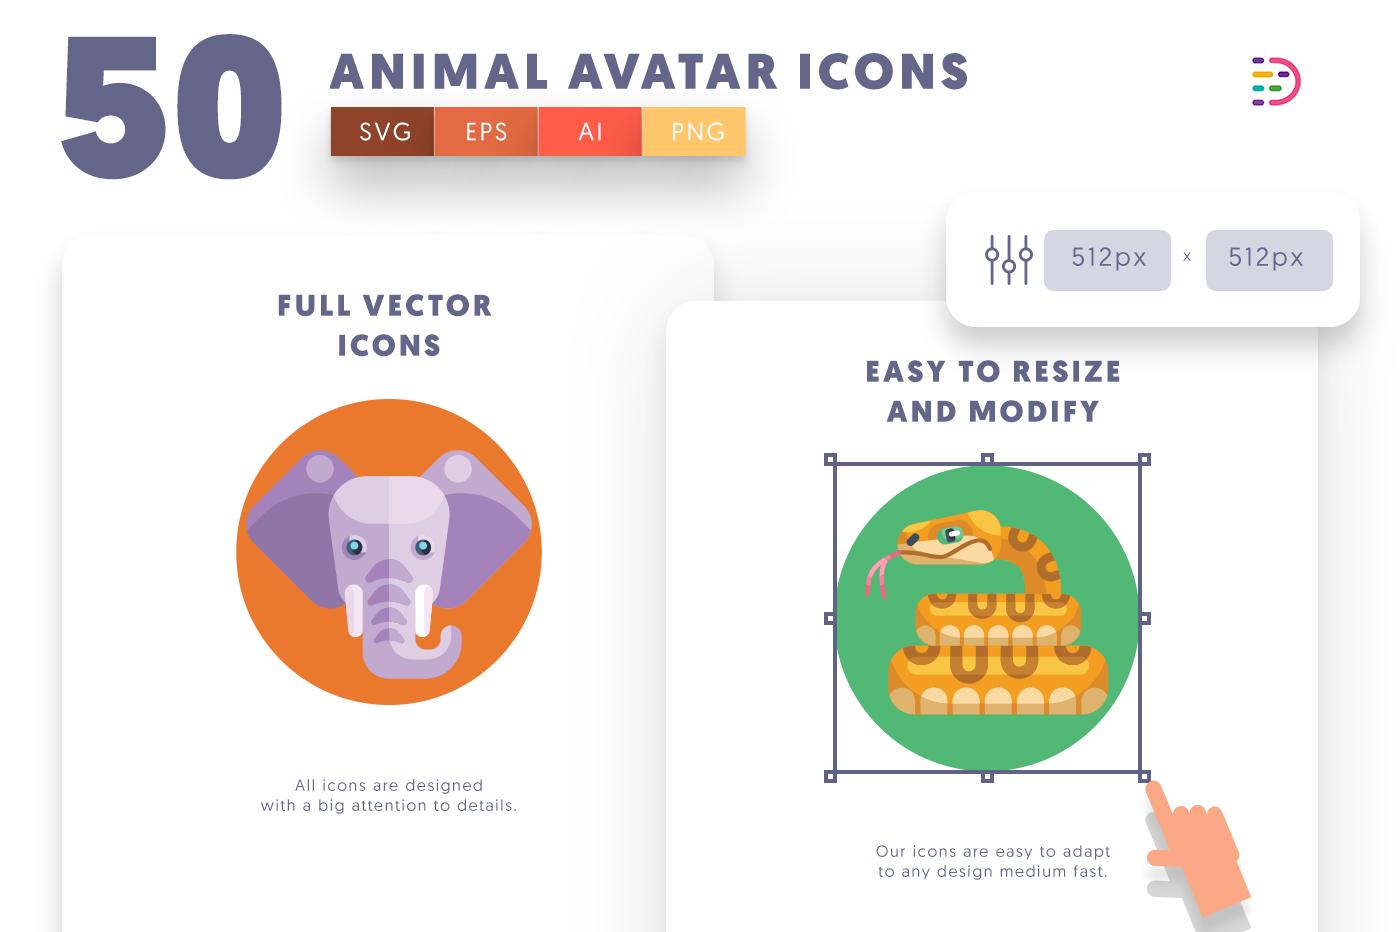 Full vector 50 Animal Avatar Icons